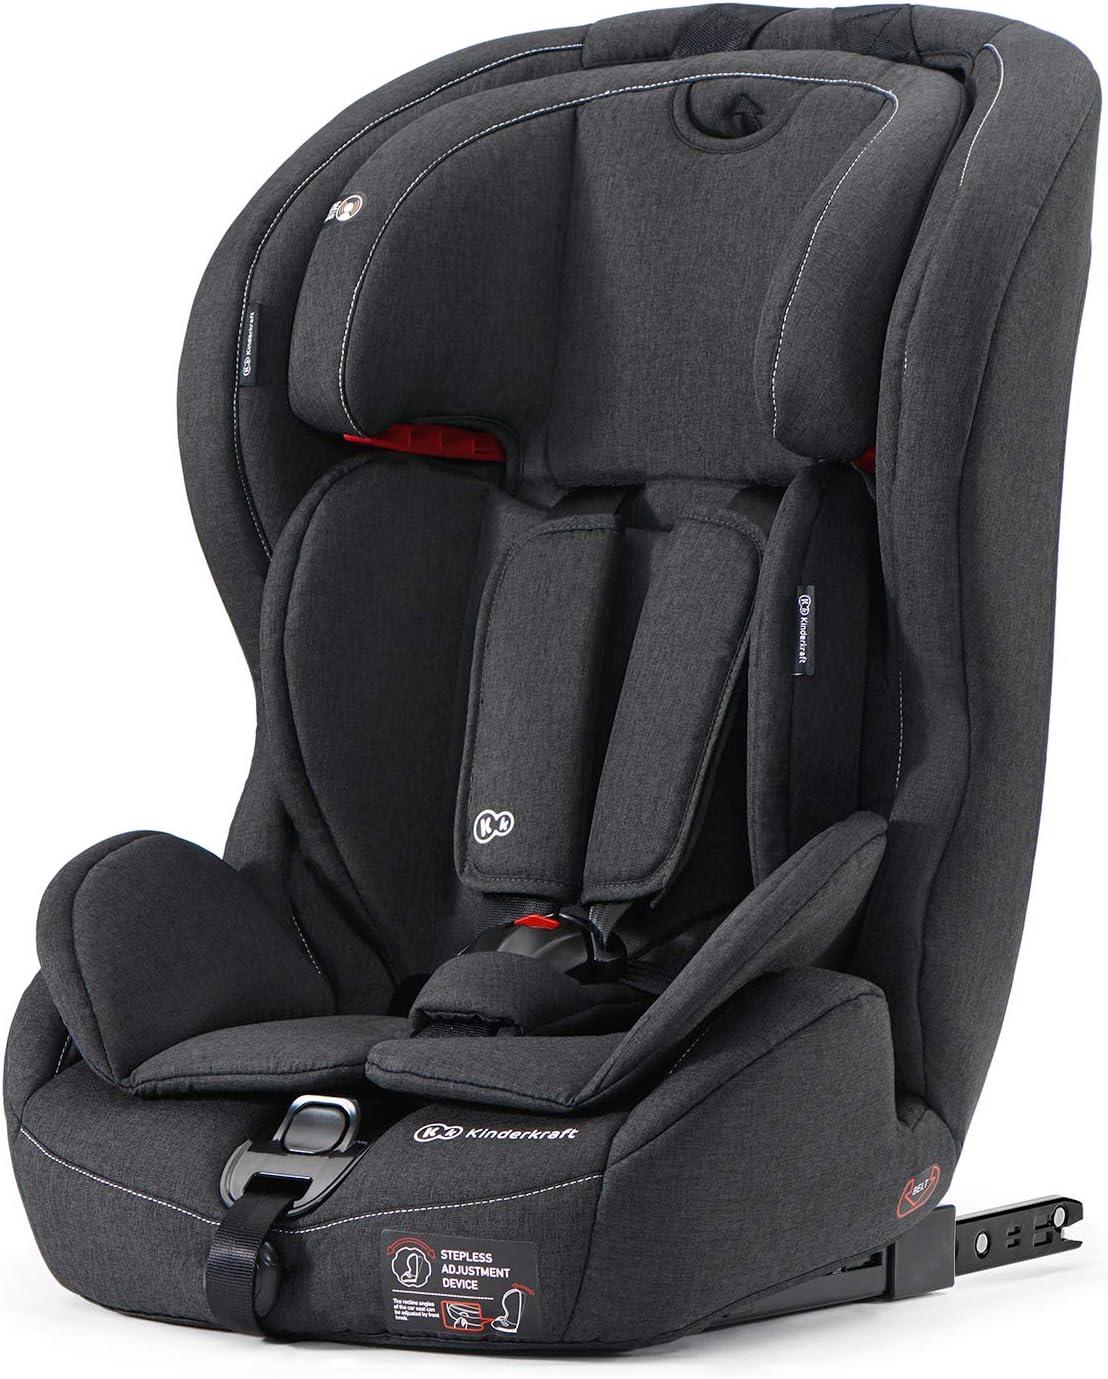 Kinderkraft Car Seat SAFETY FIX